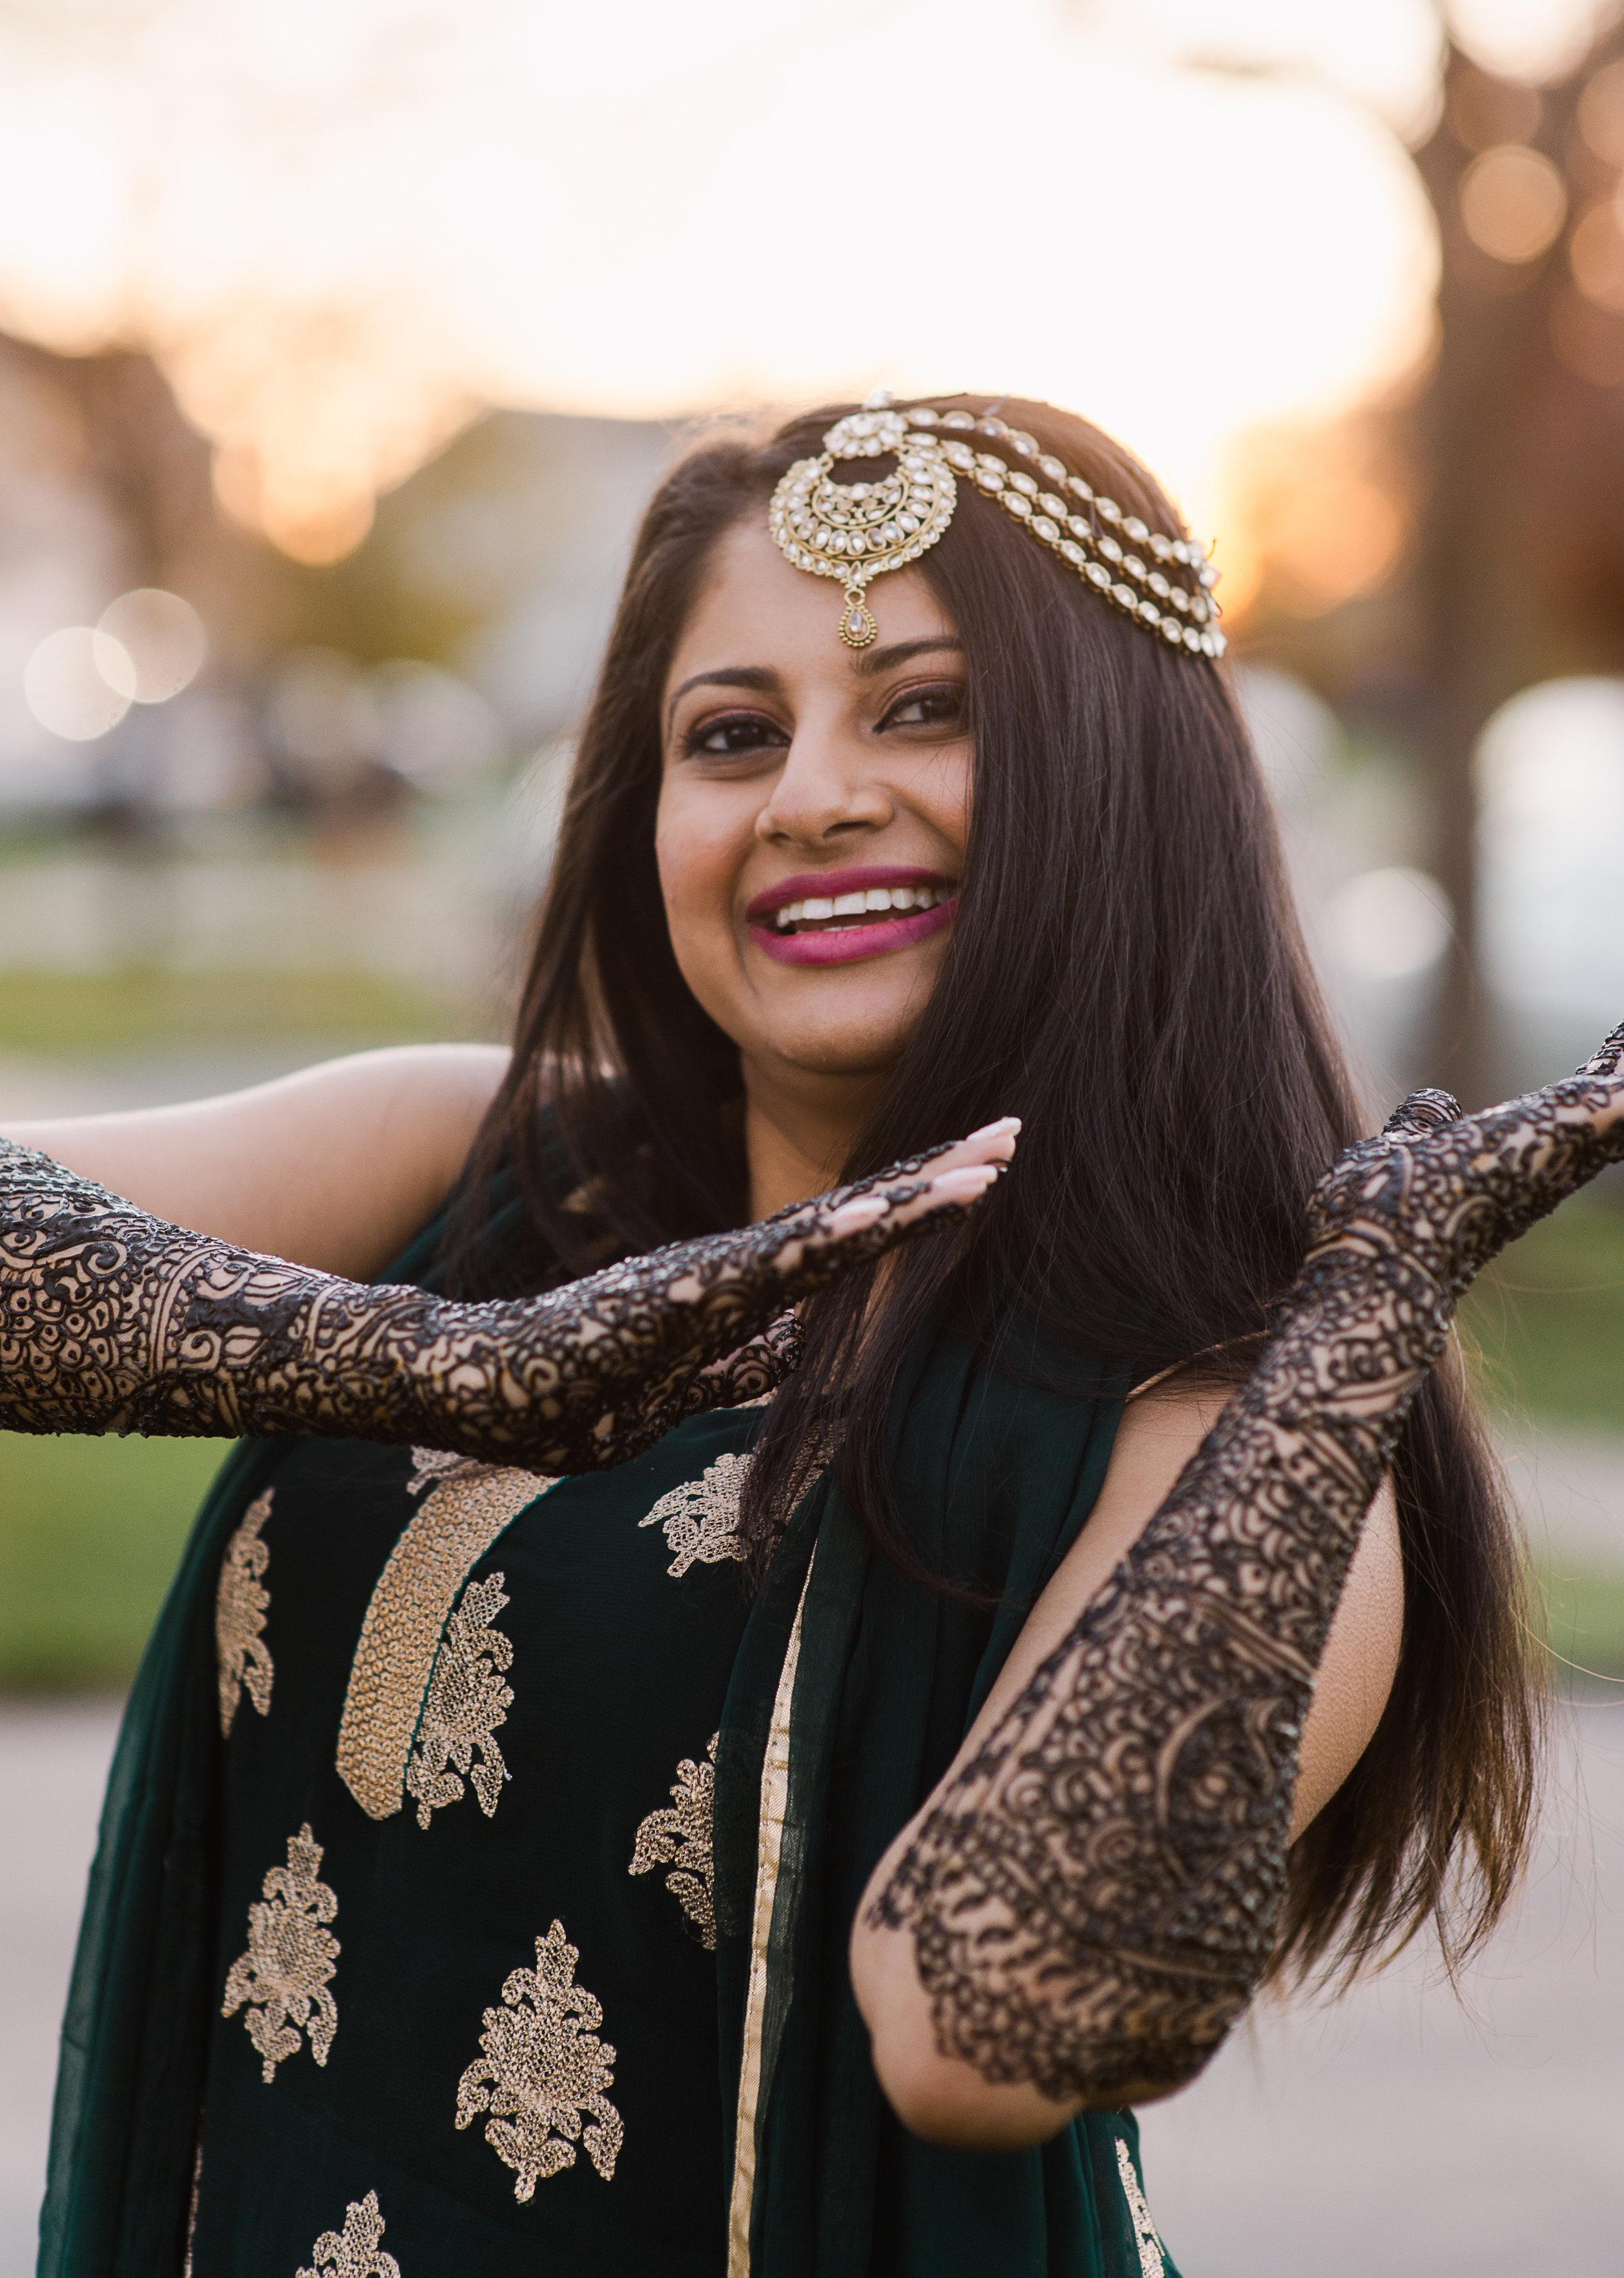 Chandni-0001-2.jpg